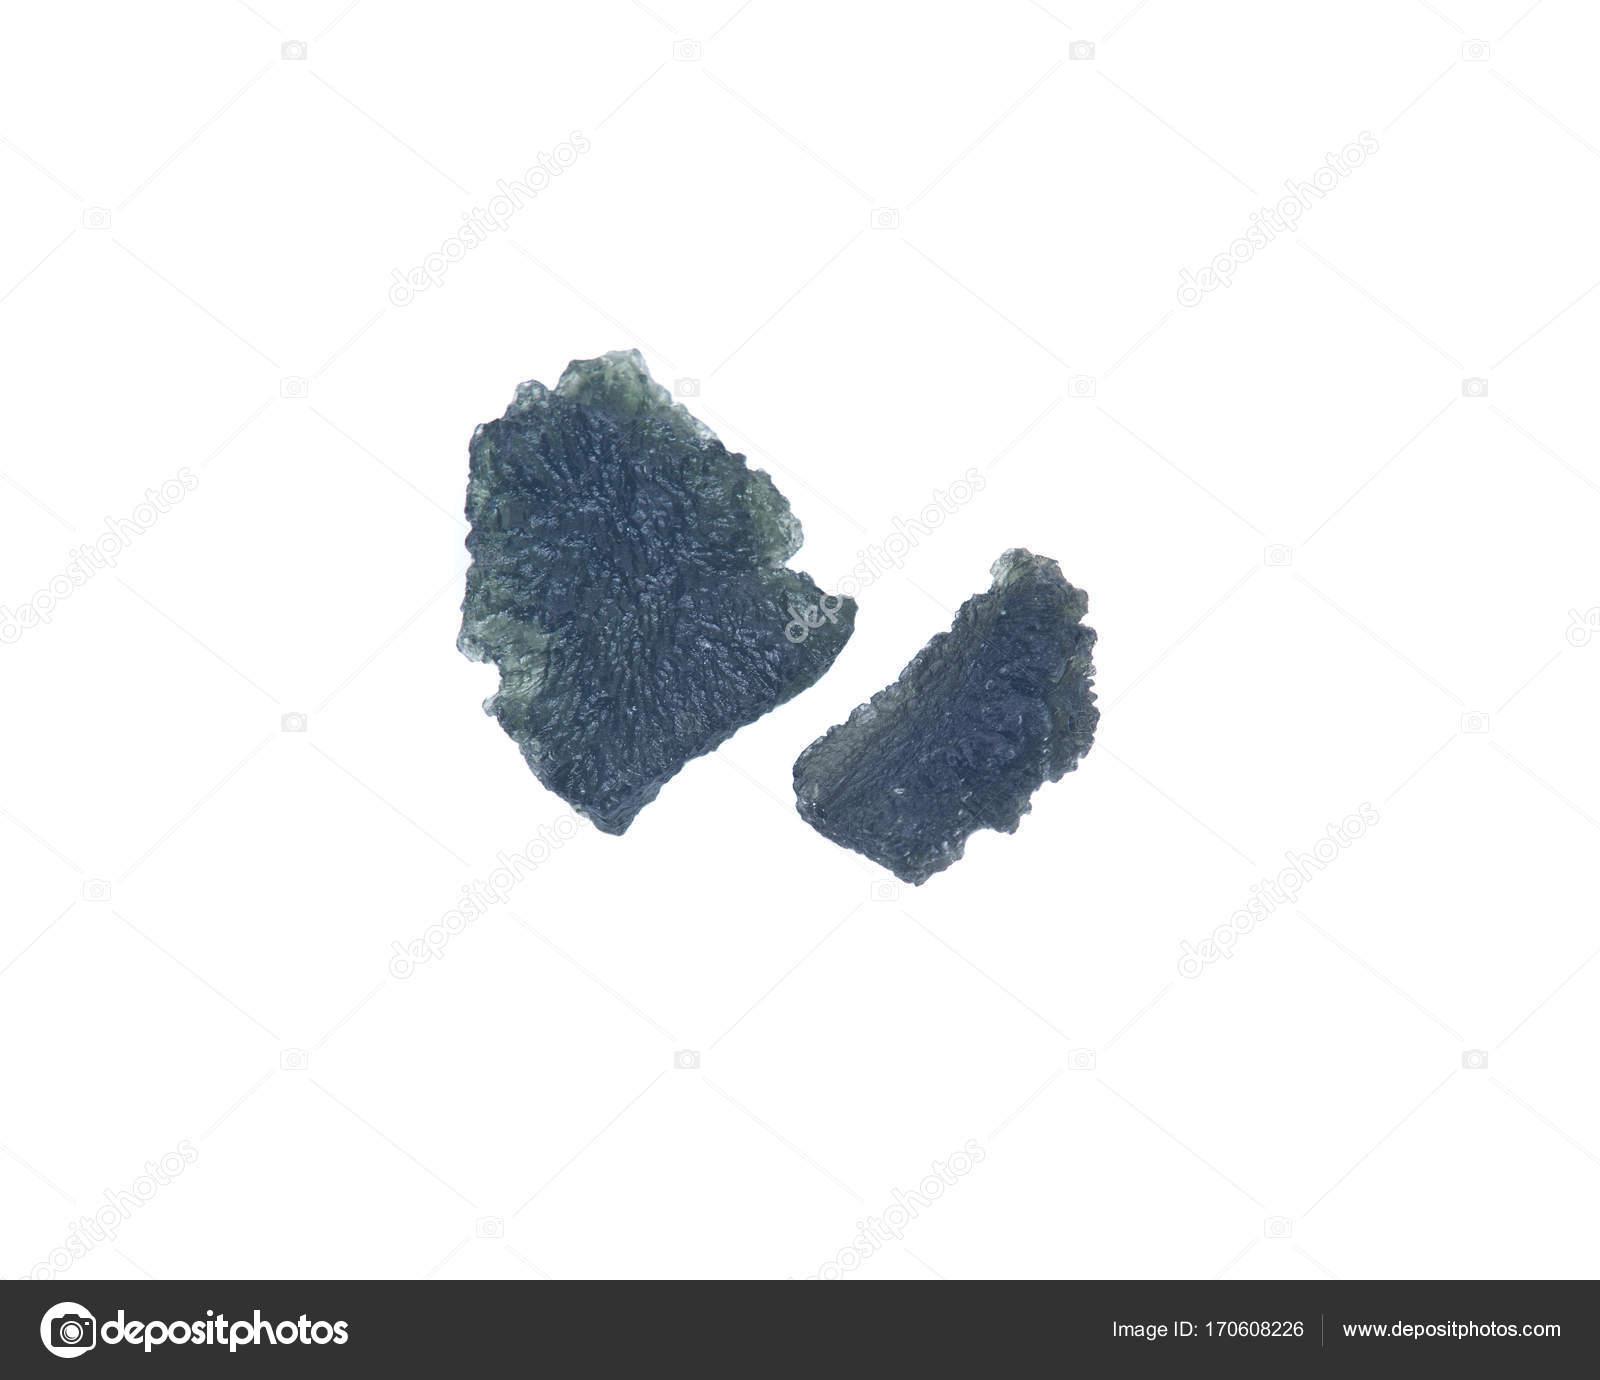 Moldavite (form of tektite found along the banks of the river Moldau